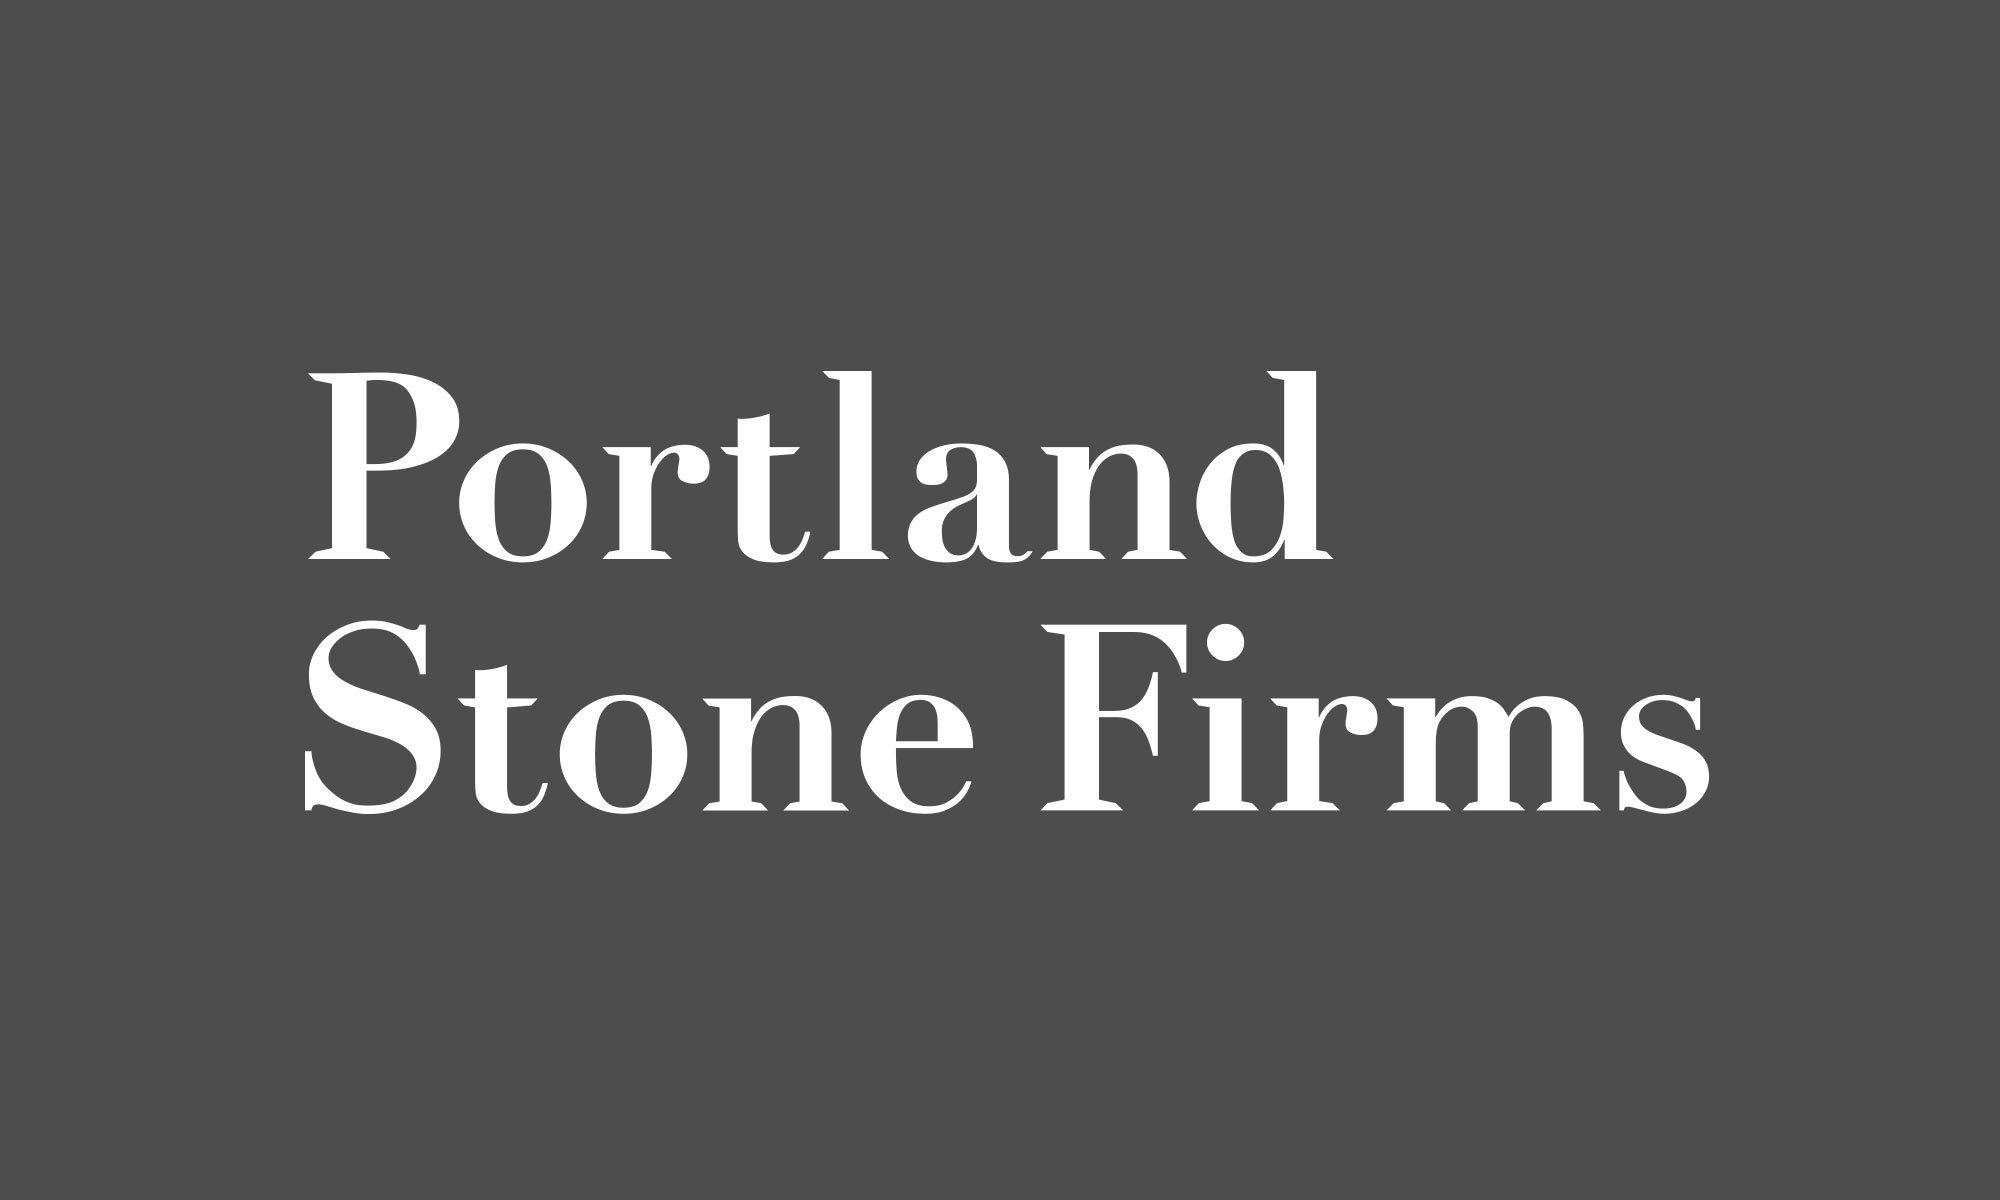 Portland Stone Firms logo